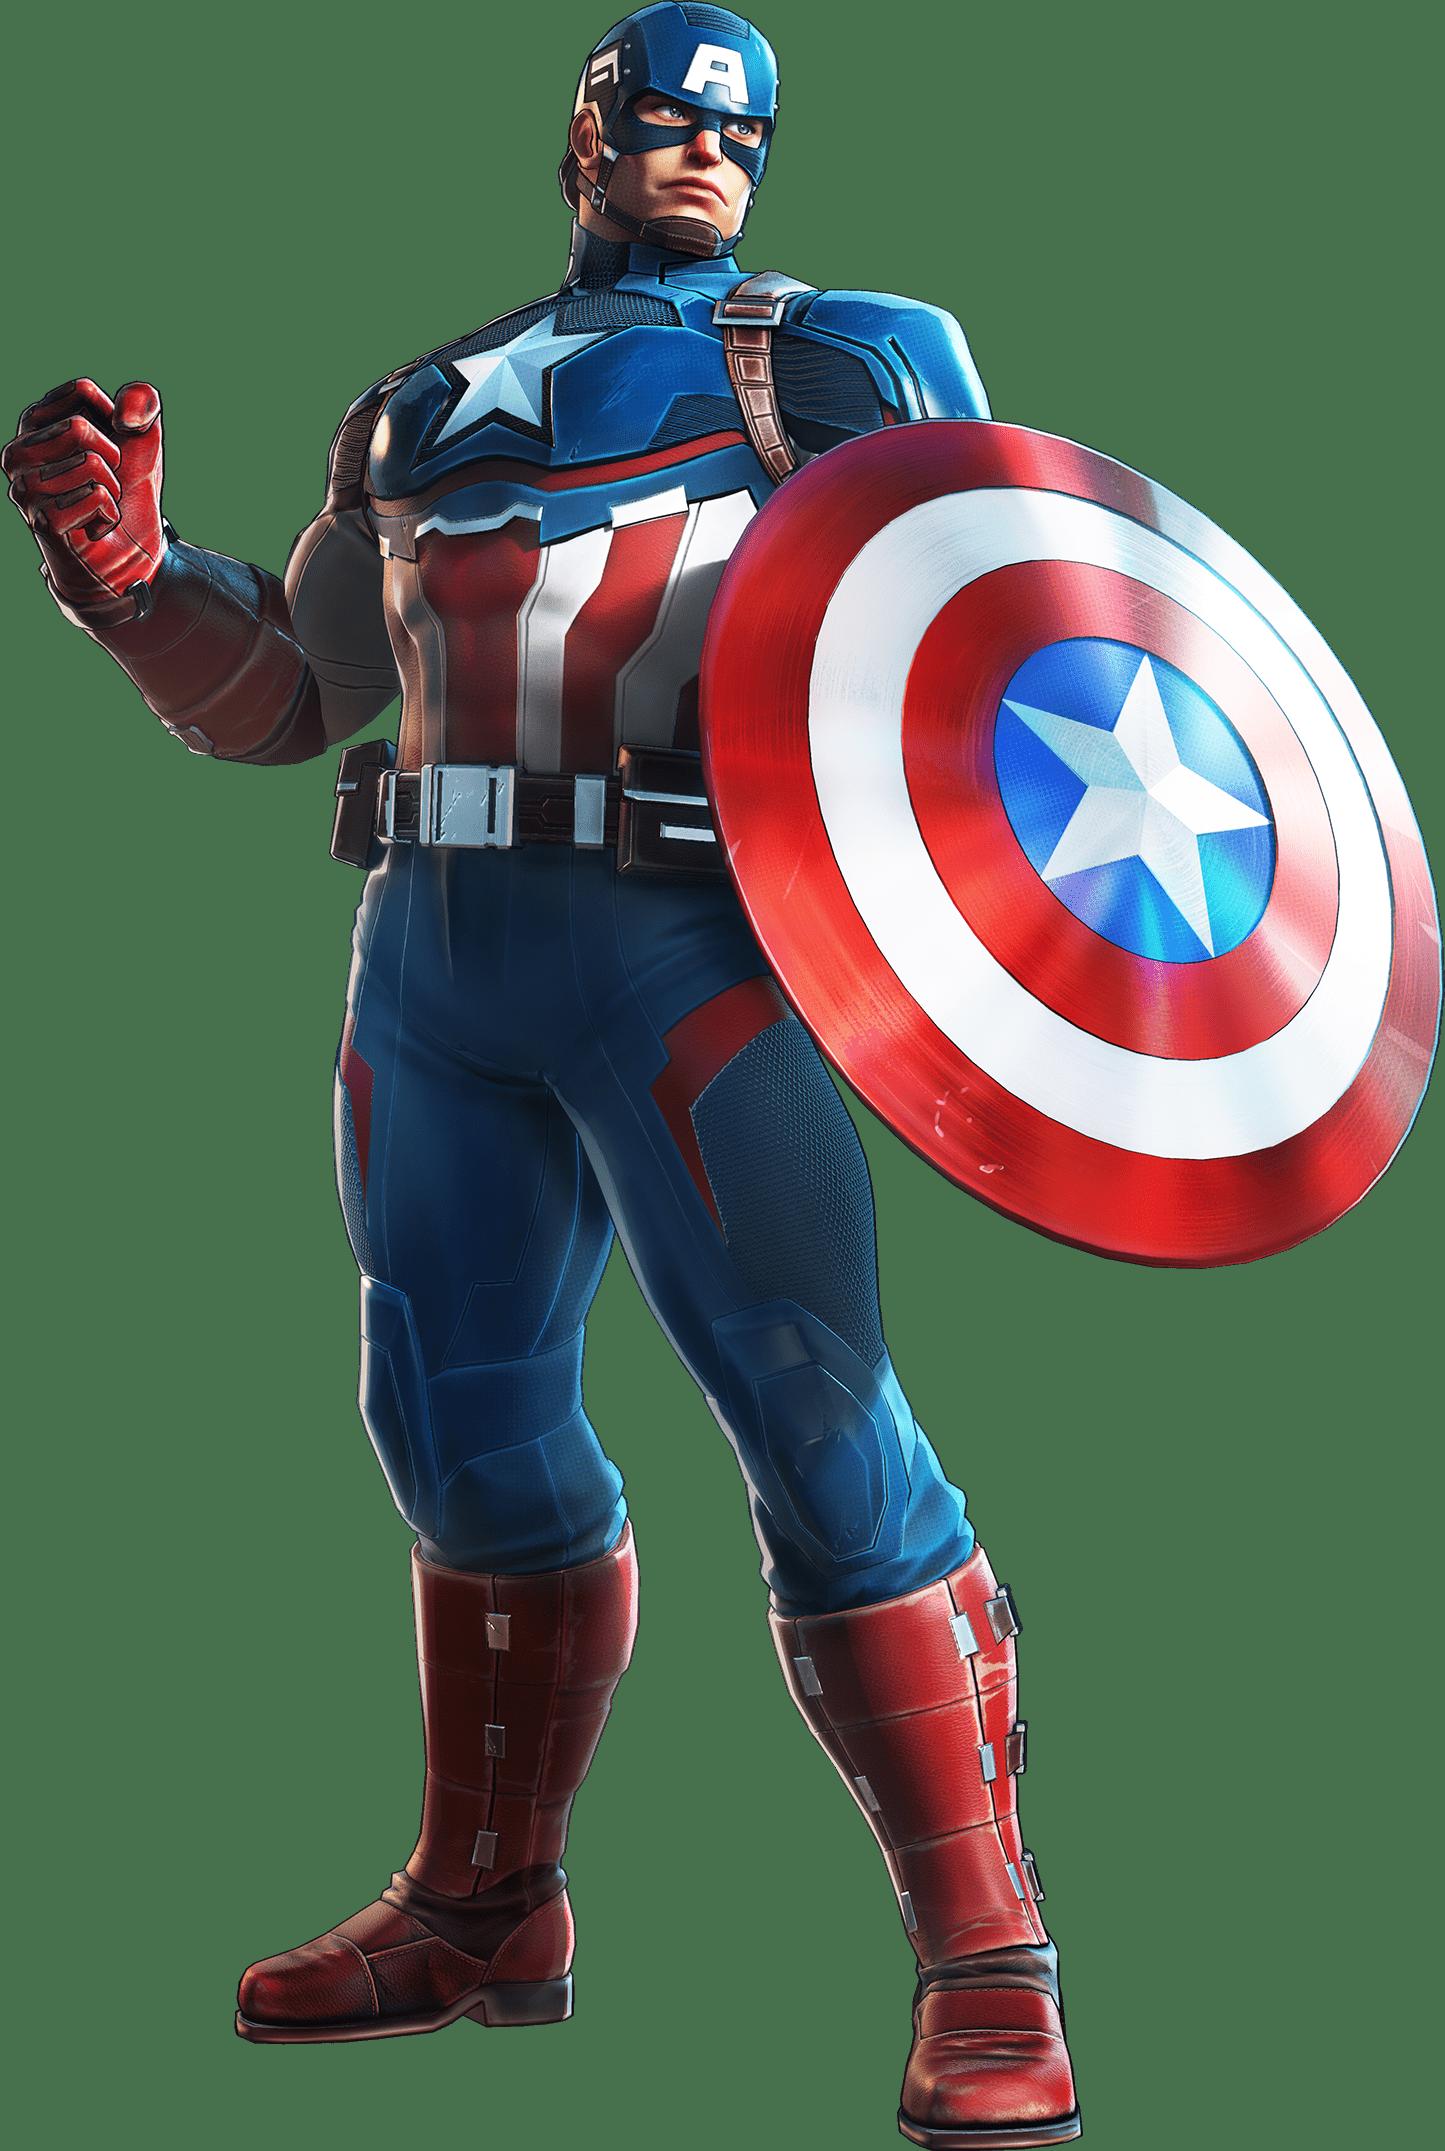 Captain America Marvel Ultimate Alliance Wiki Fandom Captain marvel girls short sleeve costume dress & headband superhero cosplay. captain america marvel ultimate